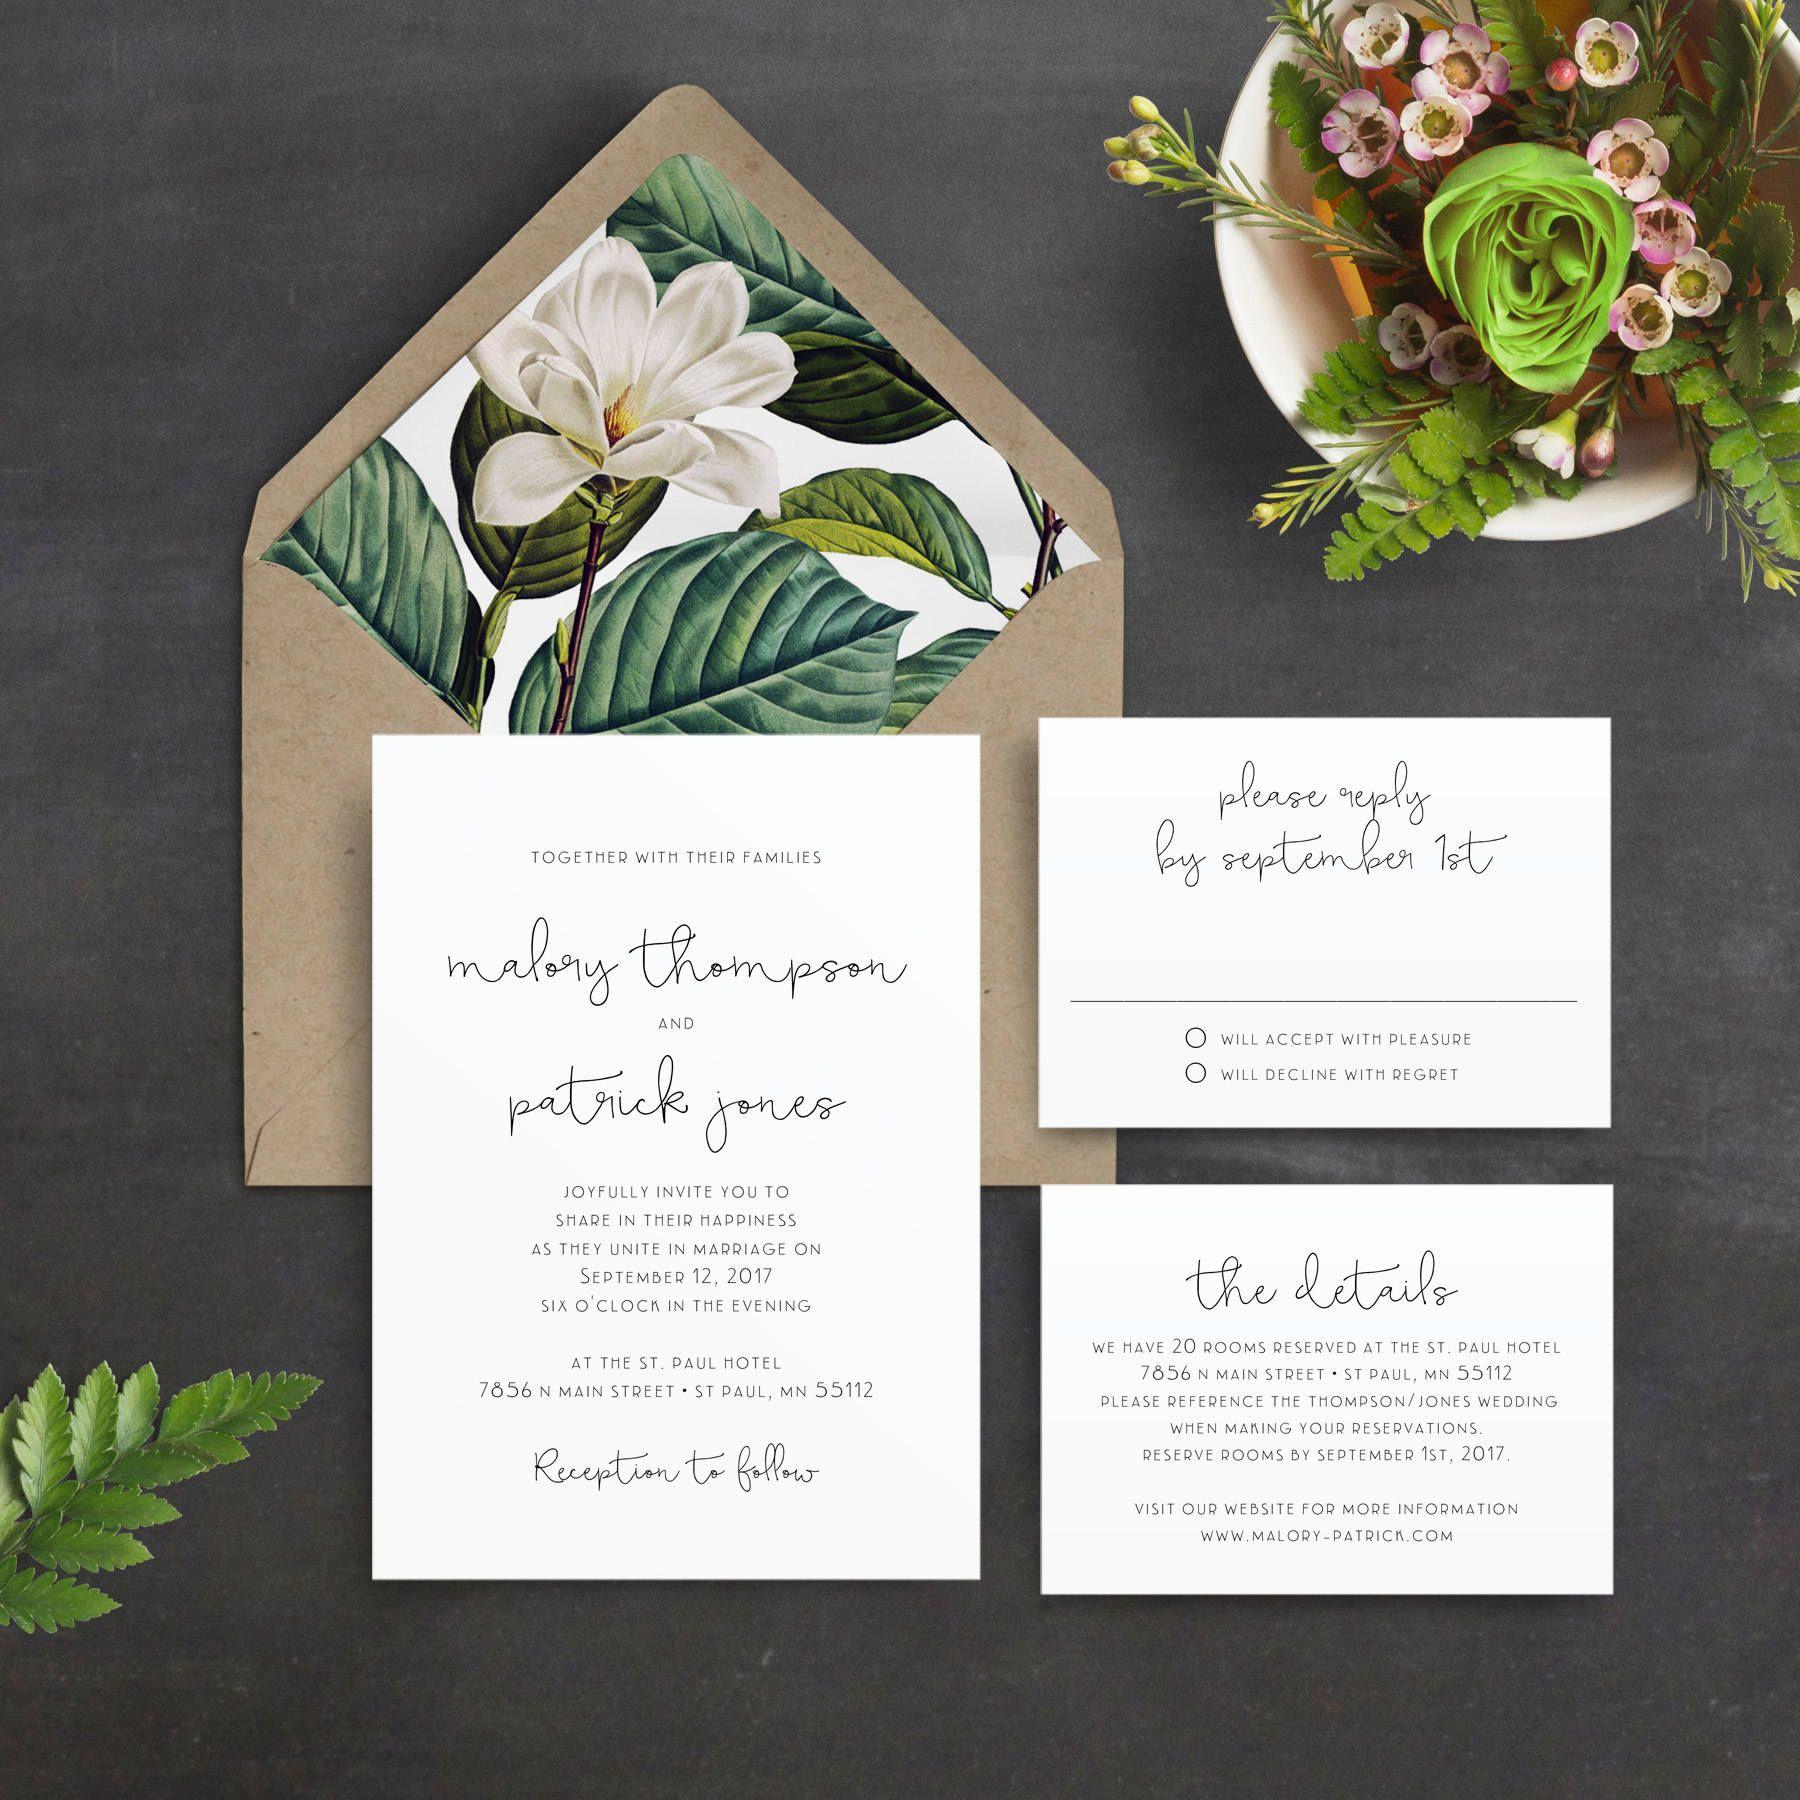 Minimal Wedding Invitation, Green Leaves, Magnolia, Script, Greenery ...